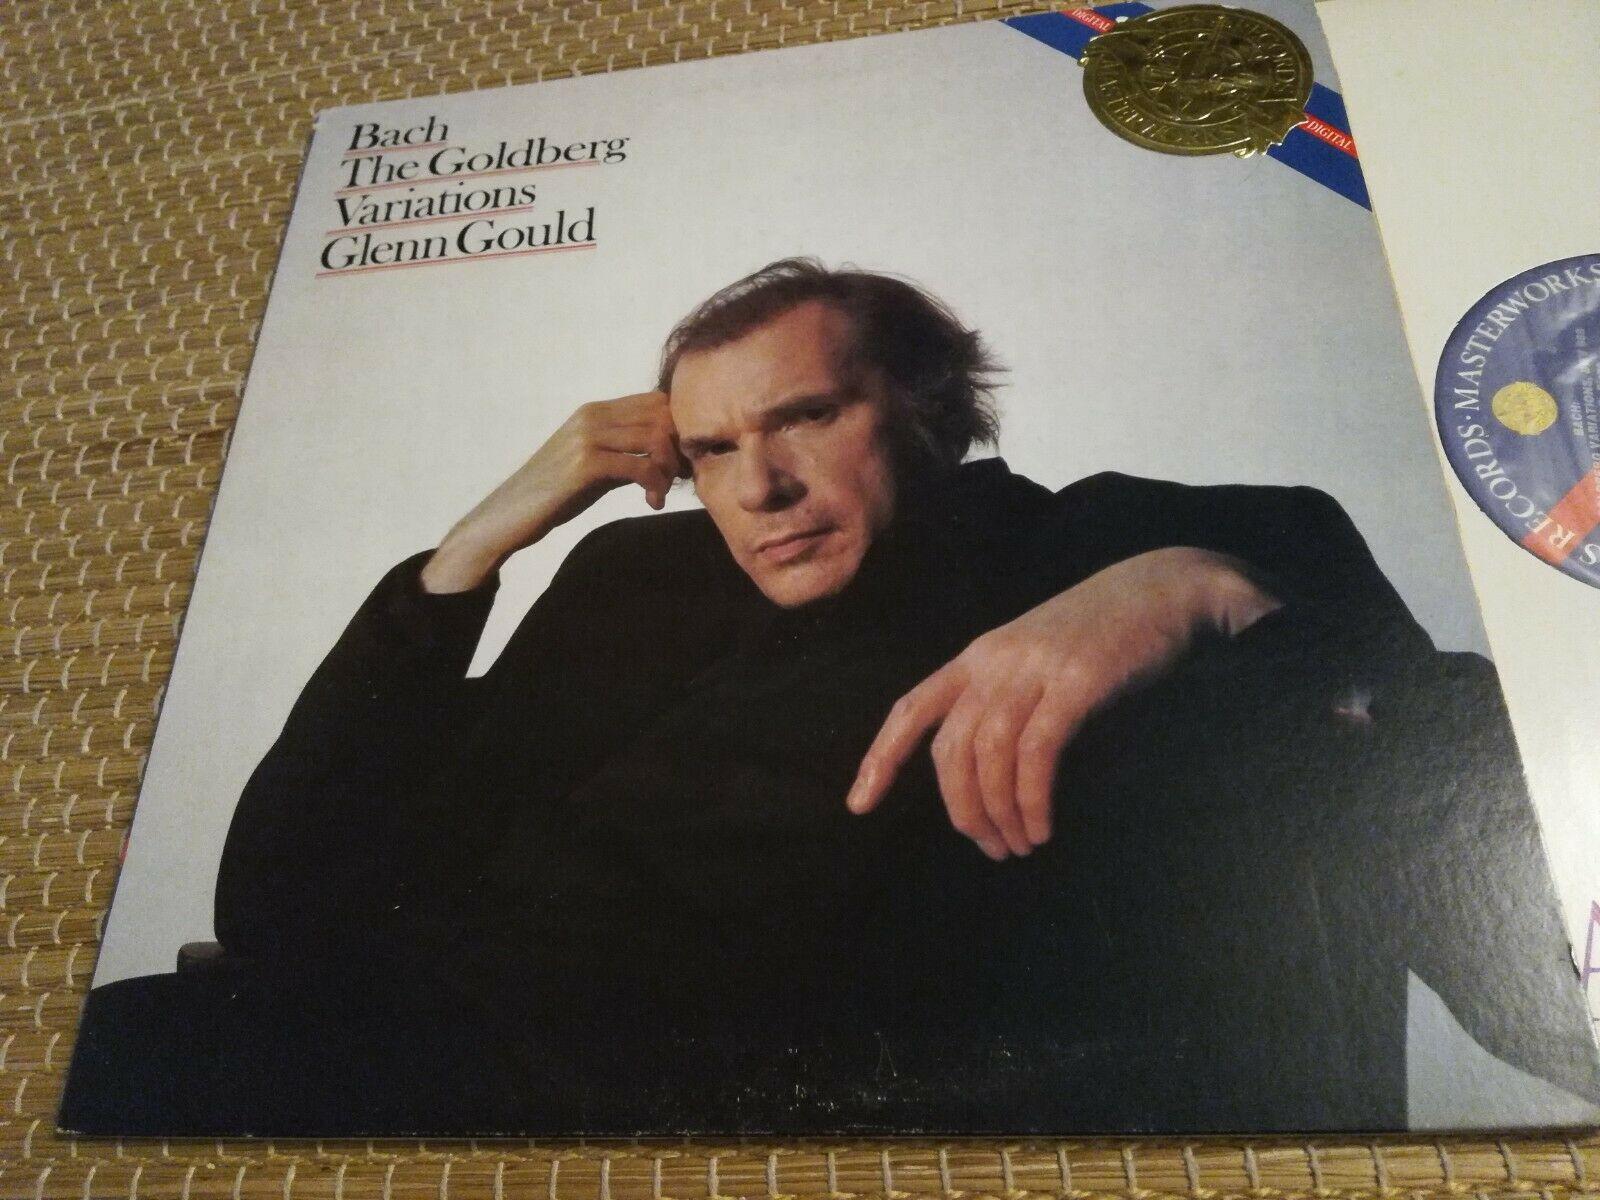 GLENN GOULD piano - Goldberg Variations BACH 1stPress 1982 CBS NM lp